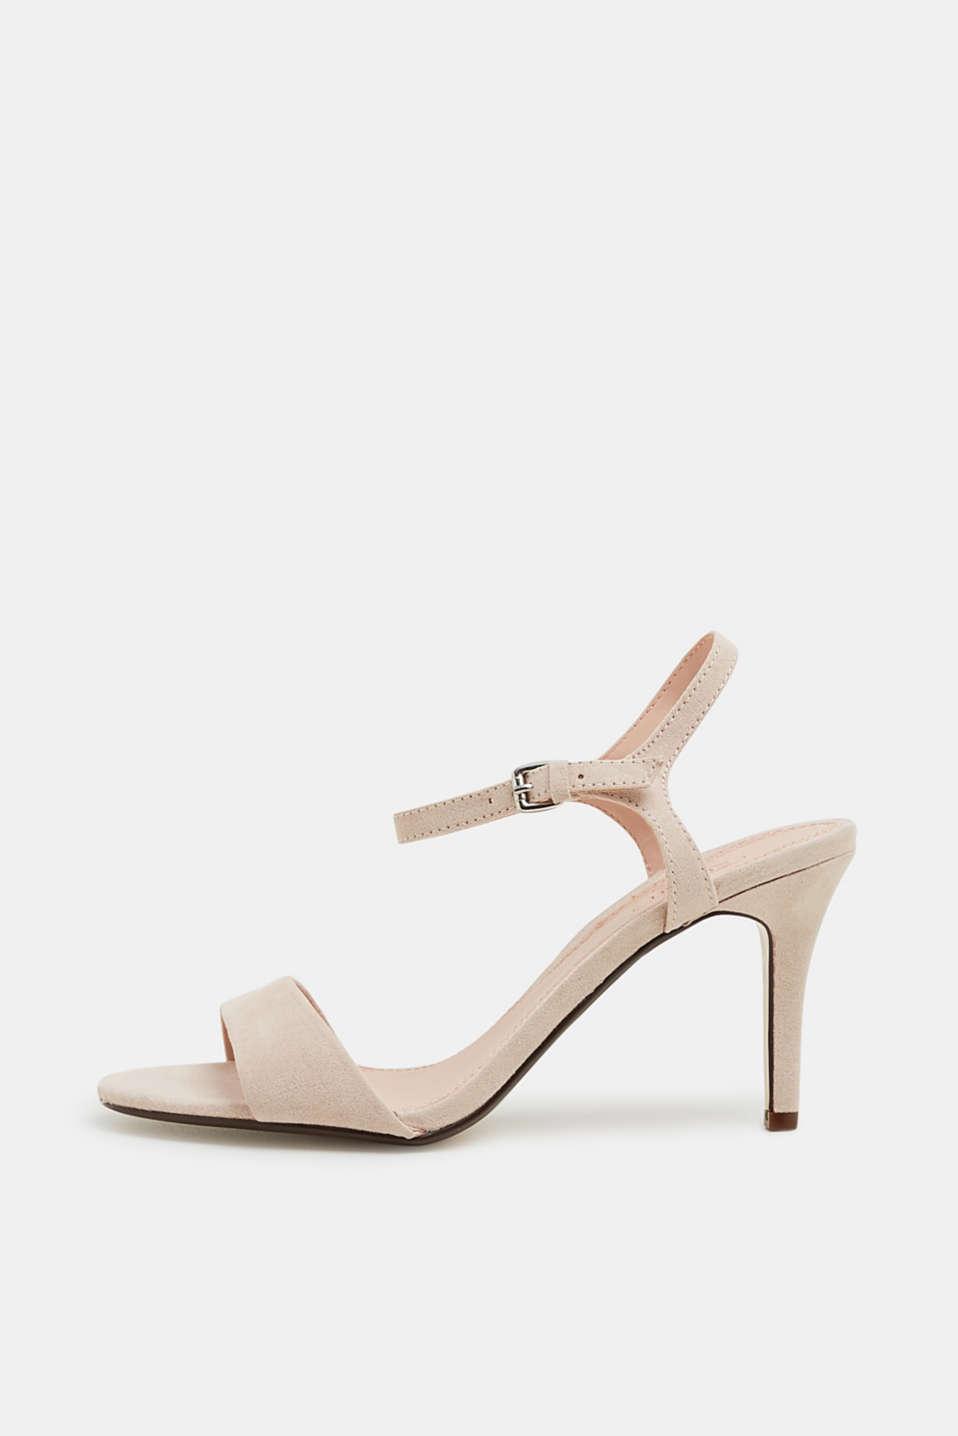 Faux suede sandals, SKIN BEIGE 2, detail image number 0